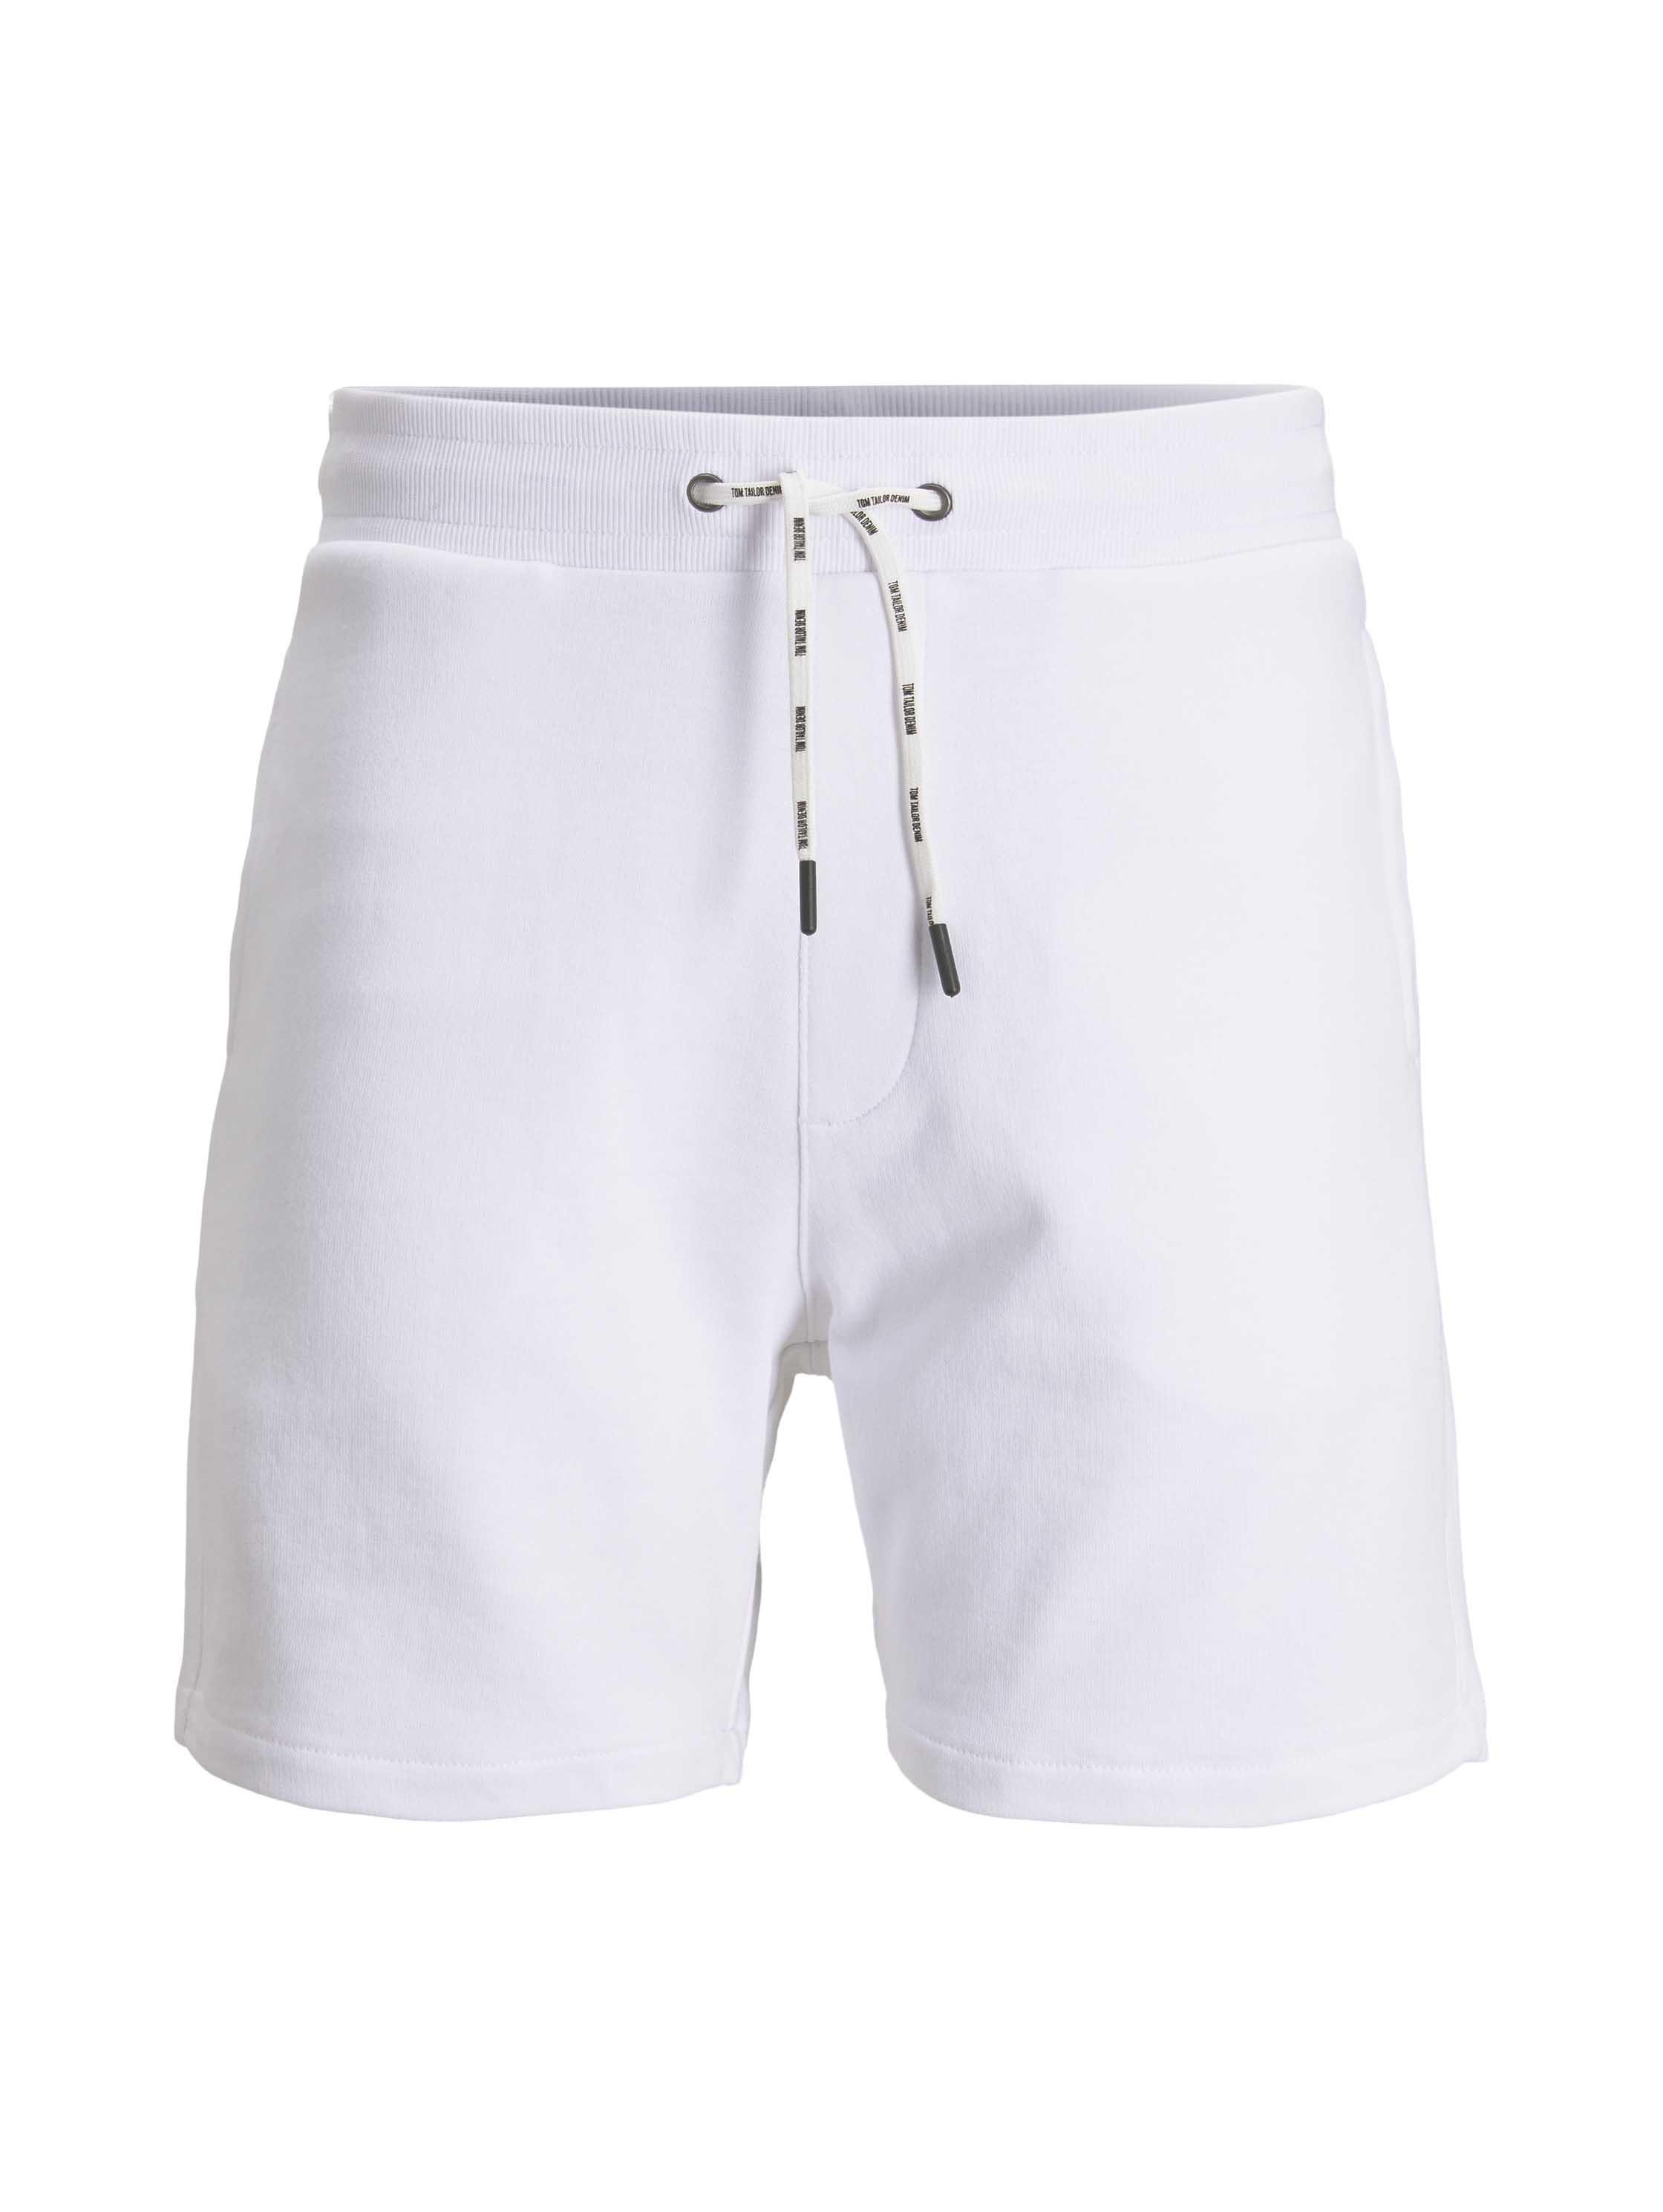 sweatshorts, White